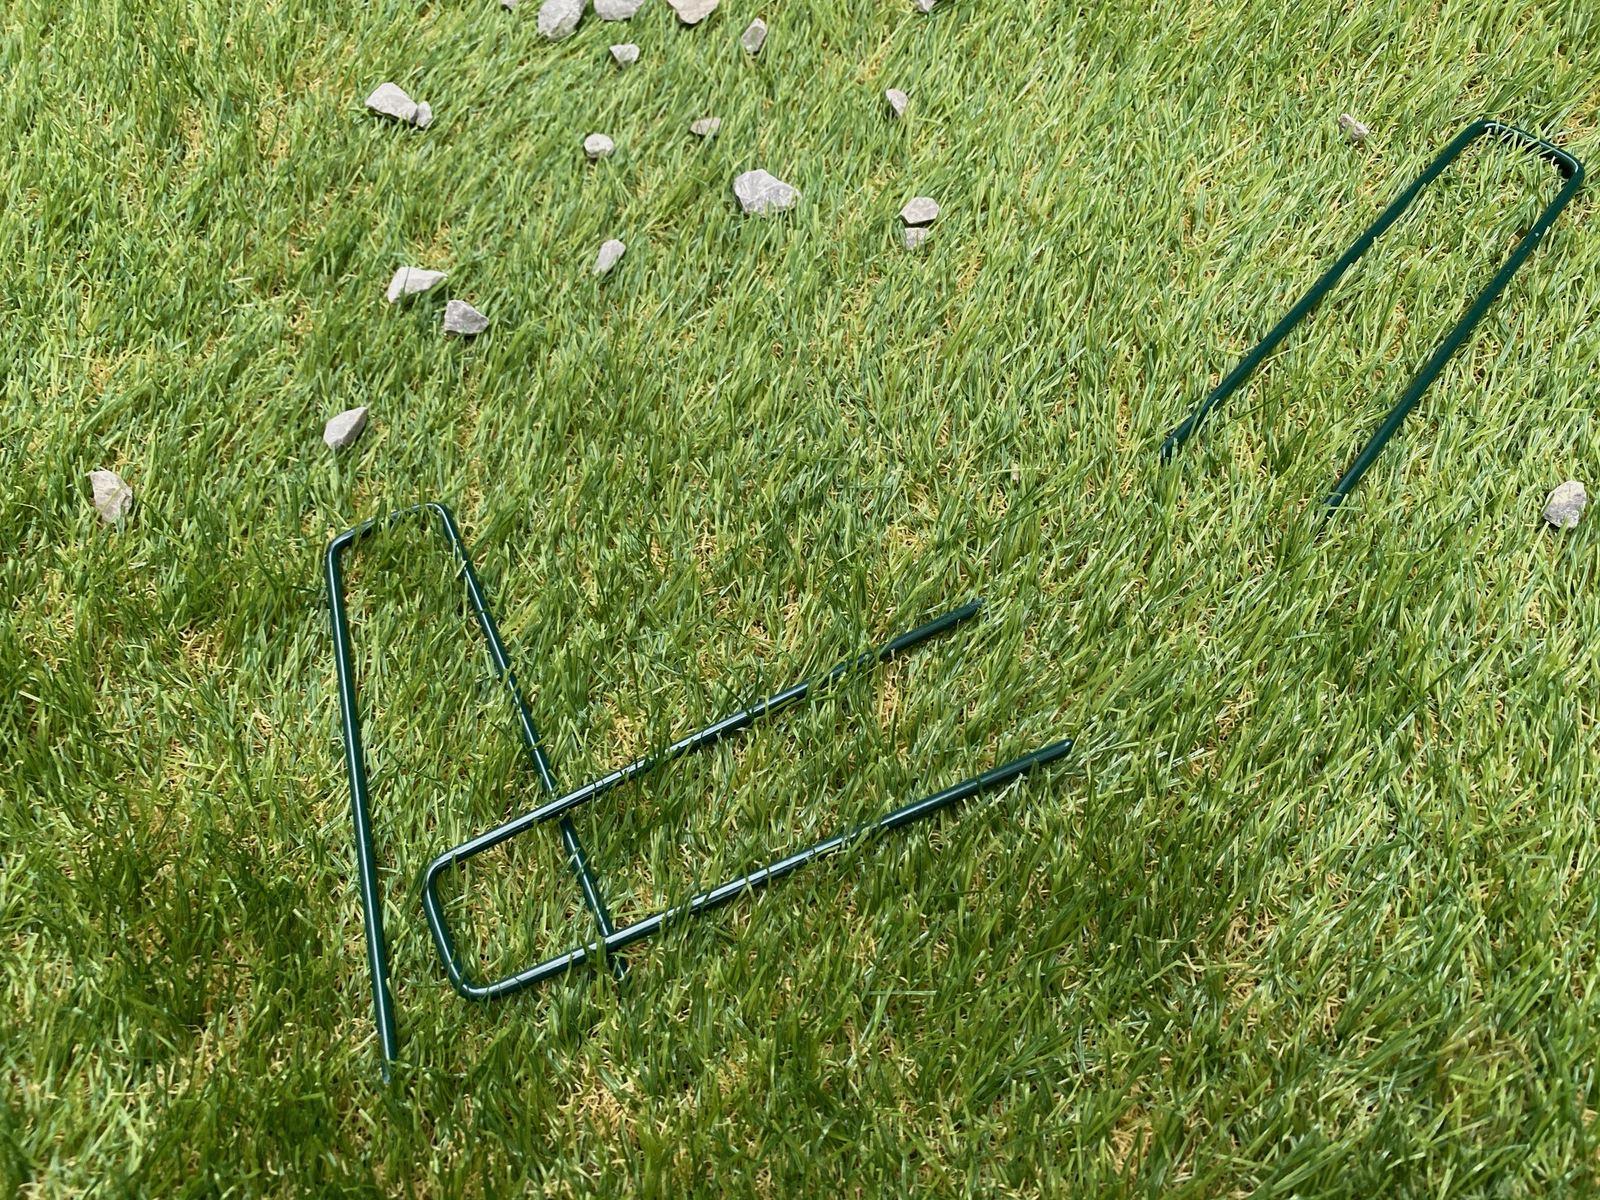 Artificial-lawn-in-backyard-review-20.jpeg